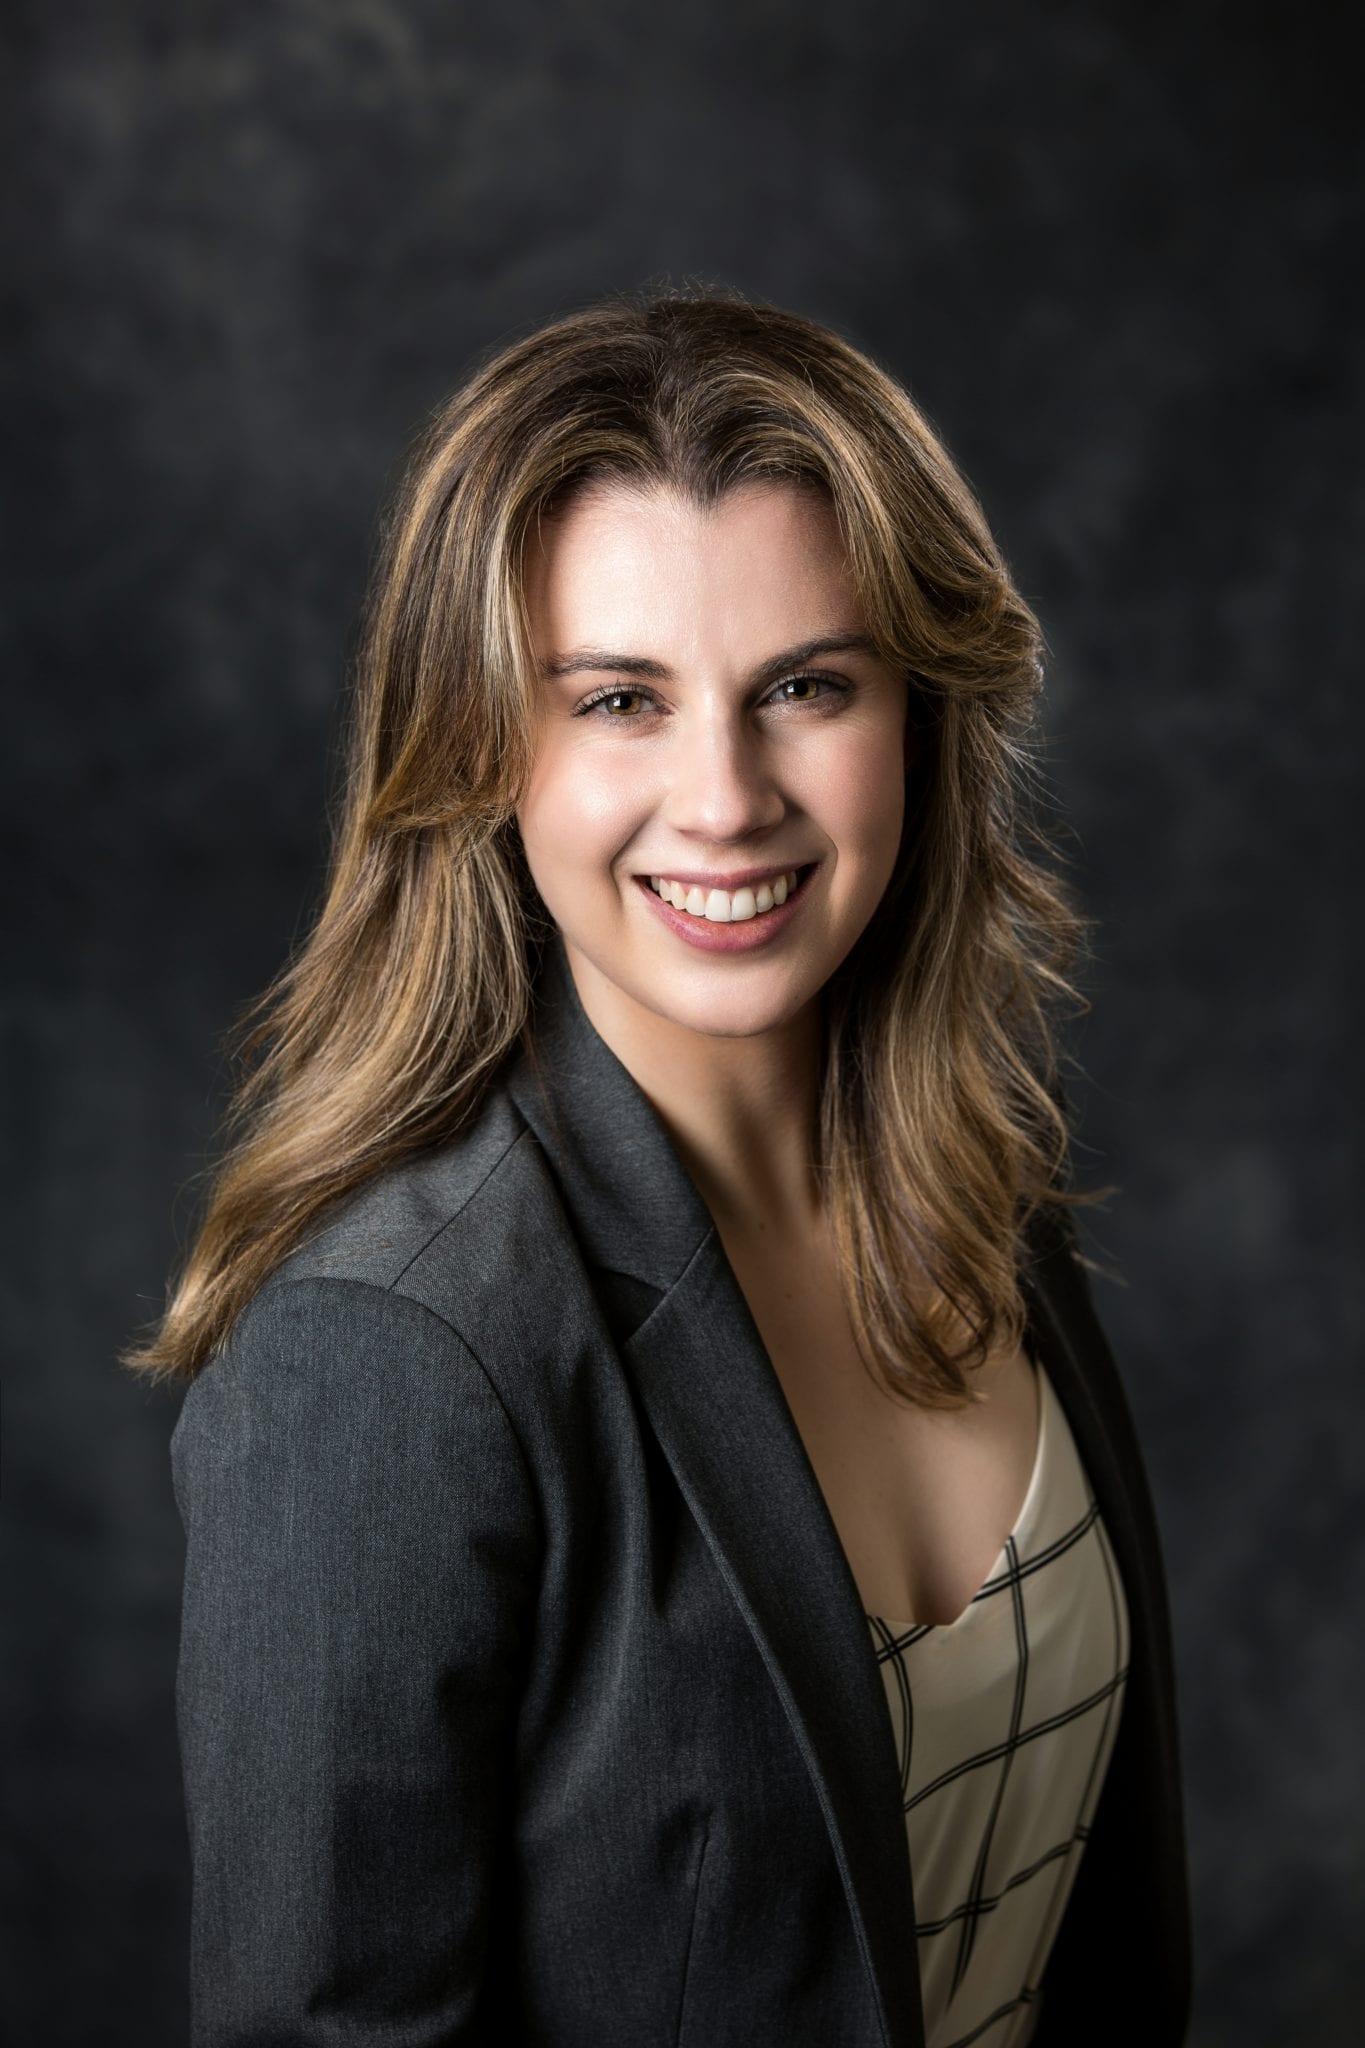 Haley Hunter